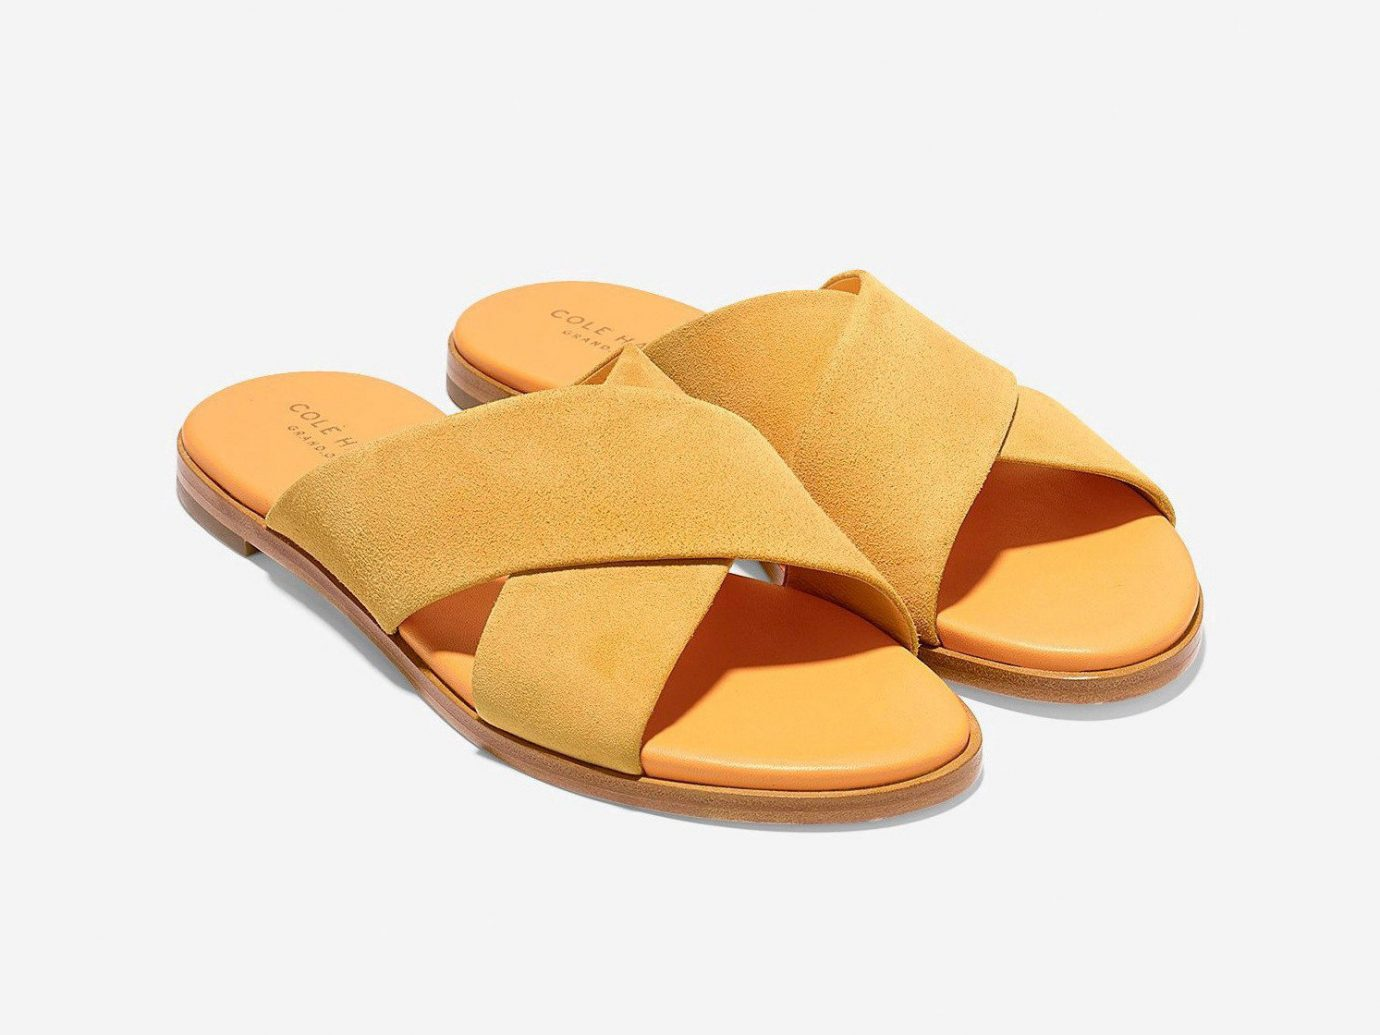 Style + Design footwear shoe outdoor shoe product design product slipper sandal walking shoe accessory